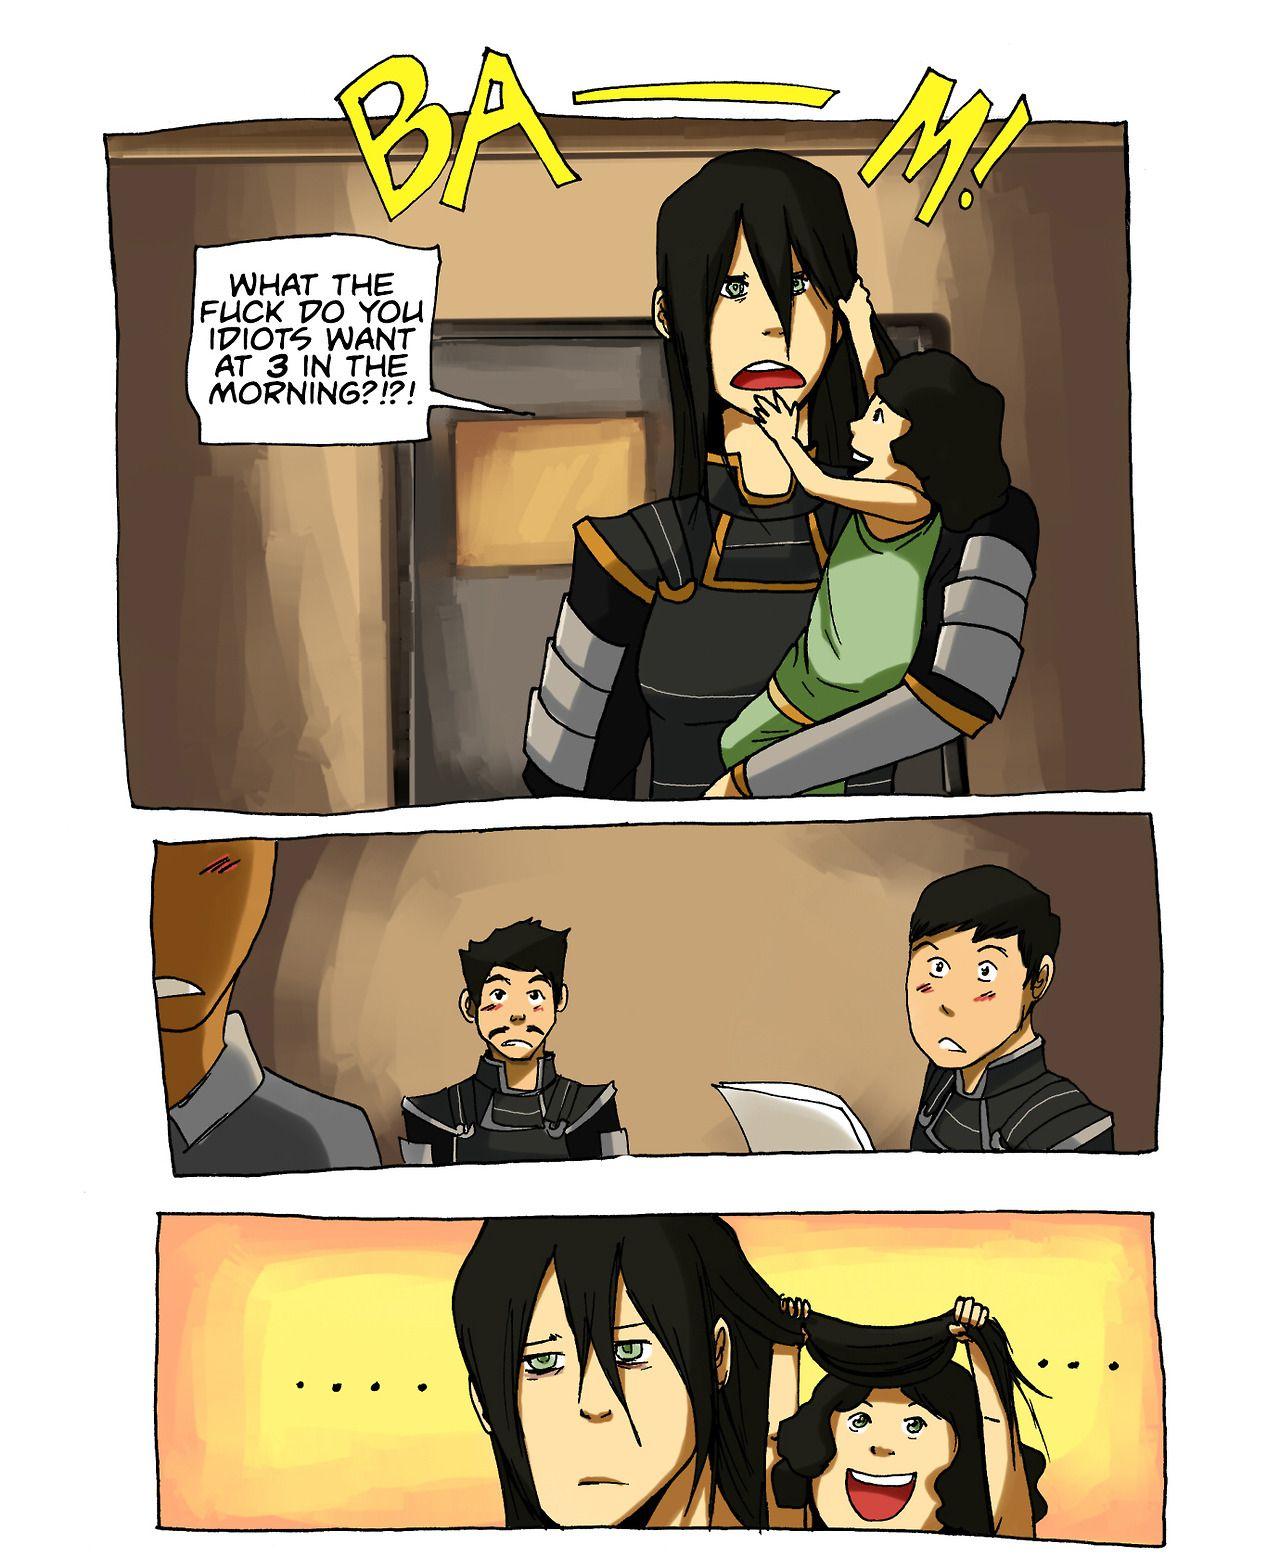 1 Avatar: Toph Police Comic By Laikkuseia.tumblr.com 1